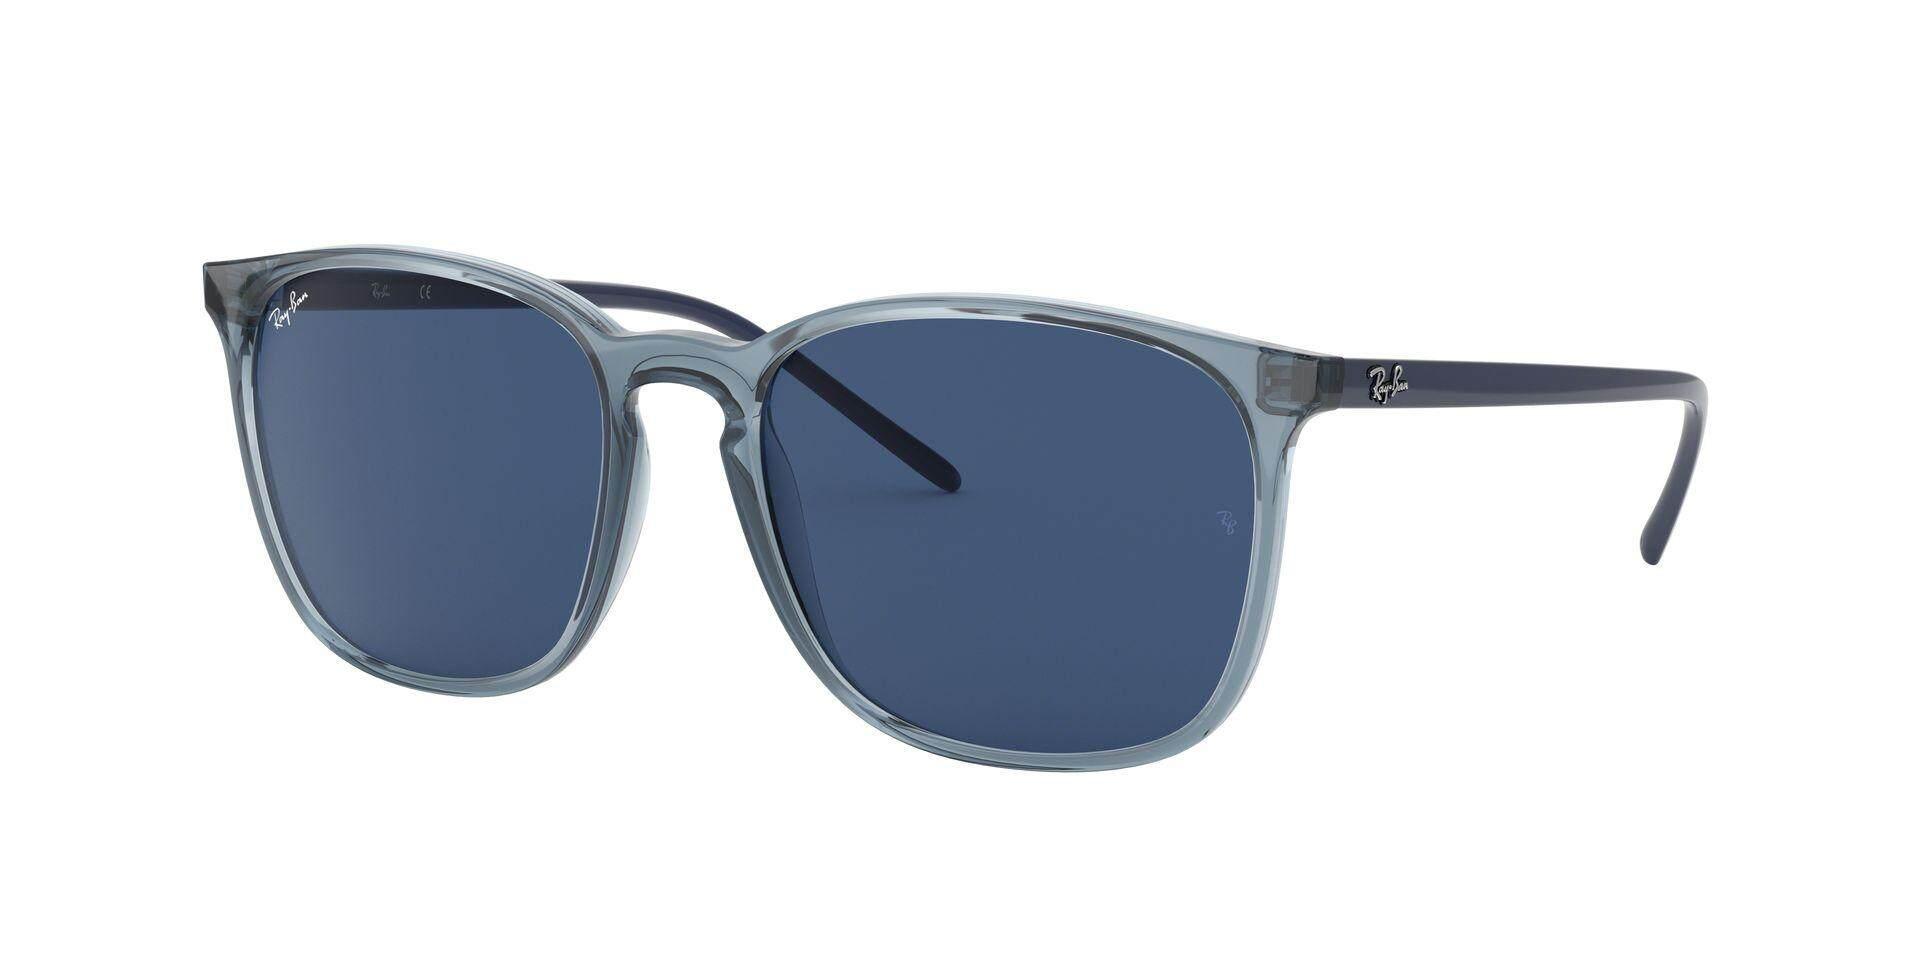 b295dd4e06 Ray-Ban Men Sunglasses price in Malaysia - Best Ray-Ban Men ...